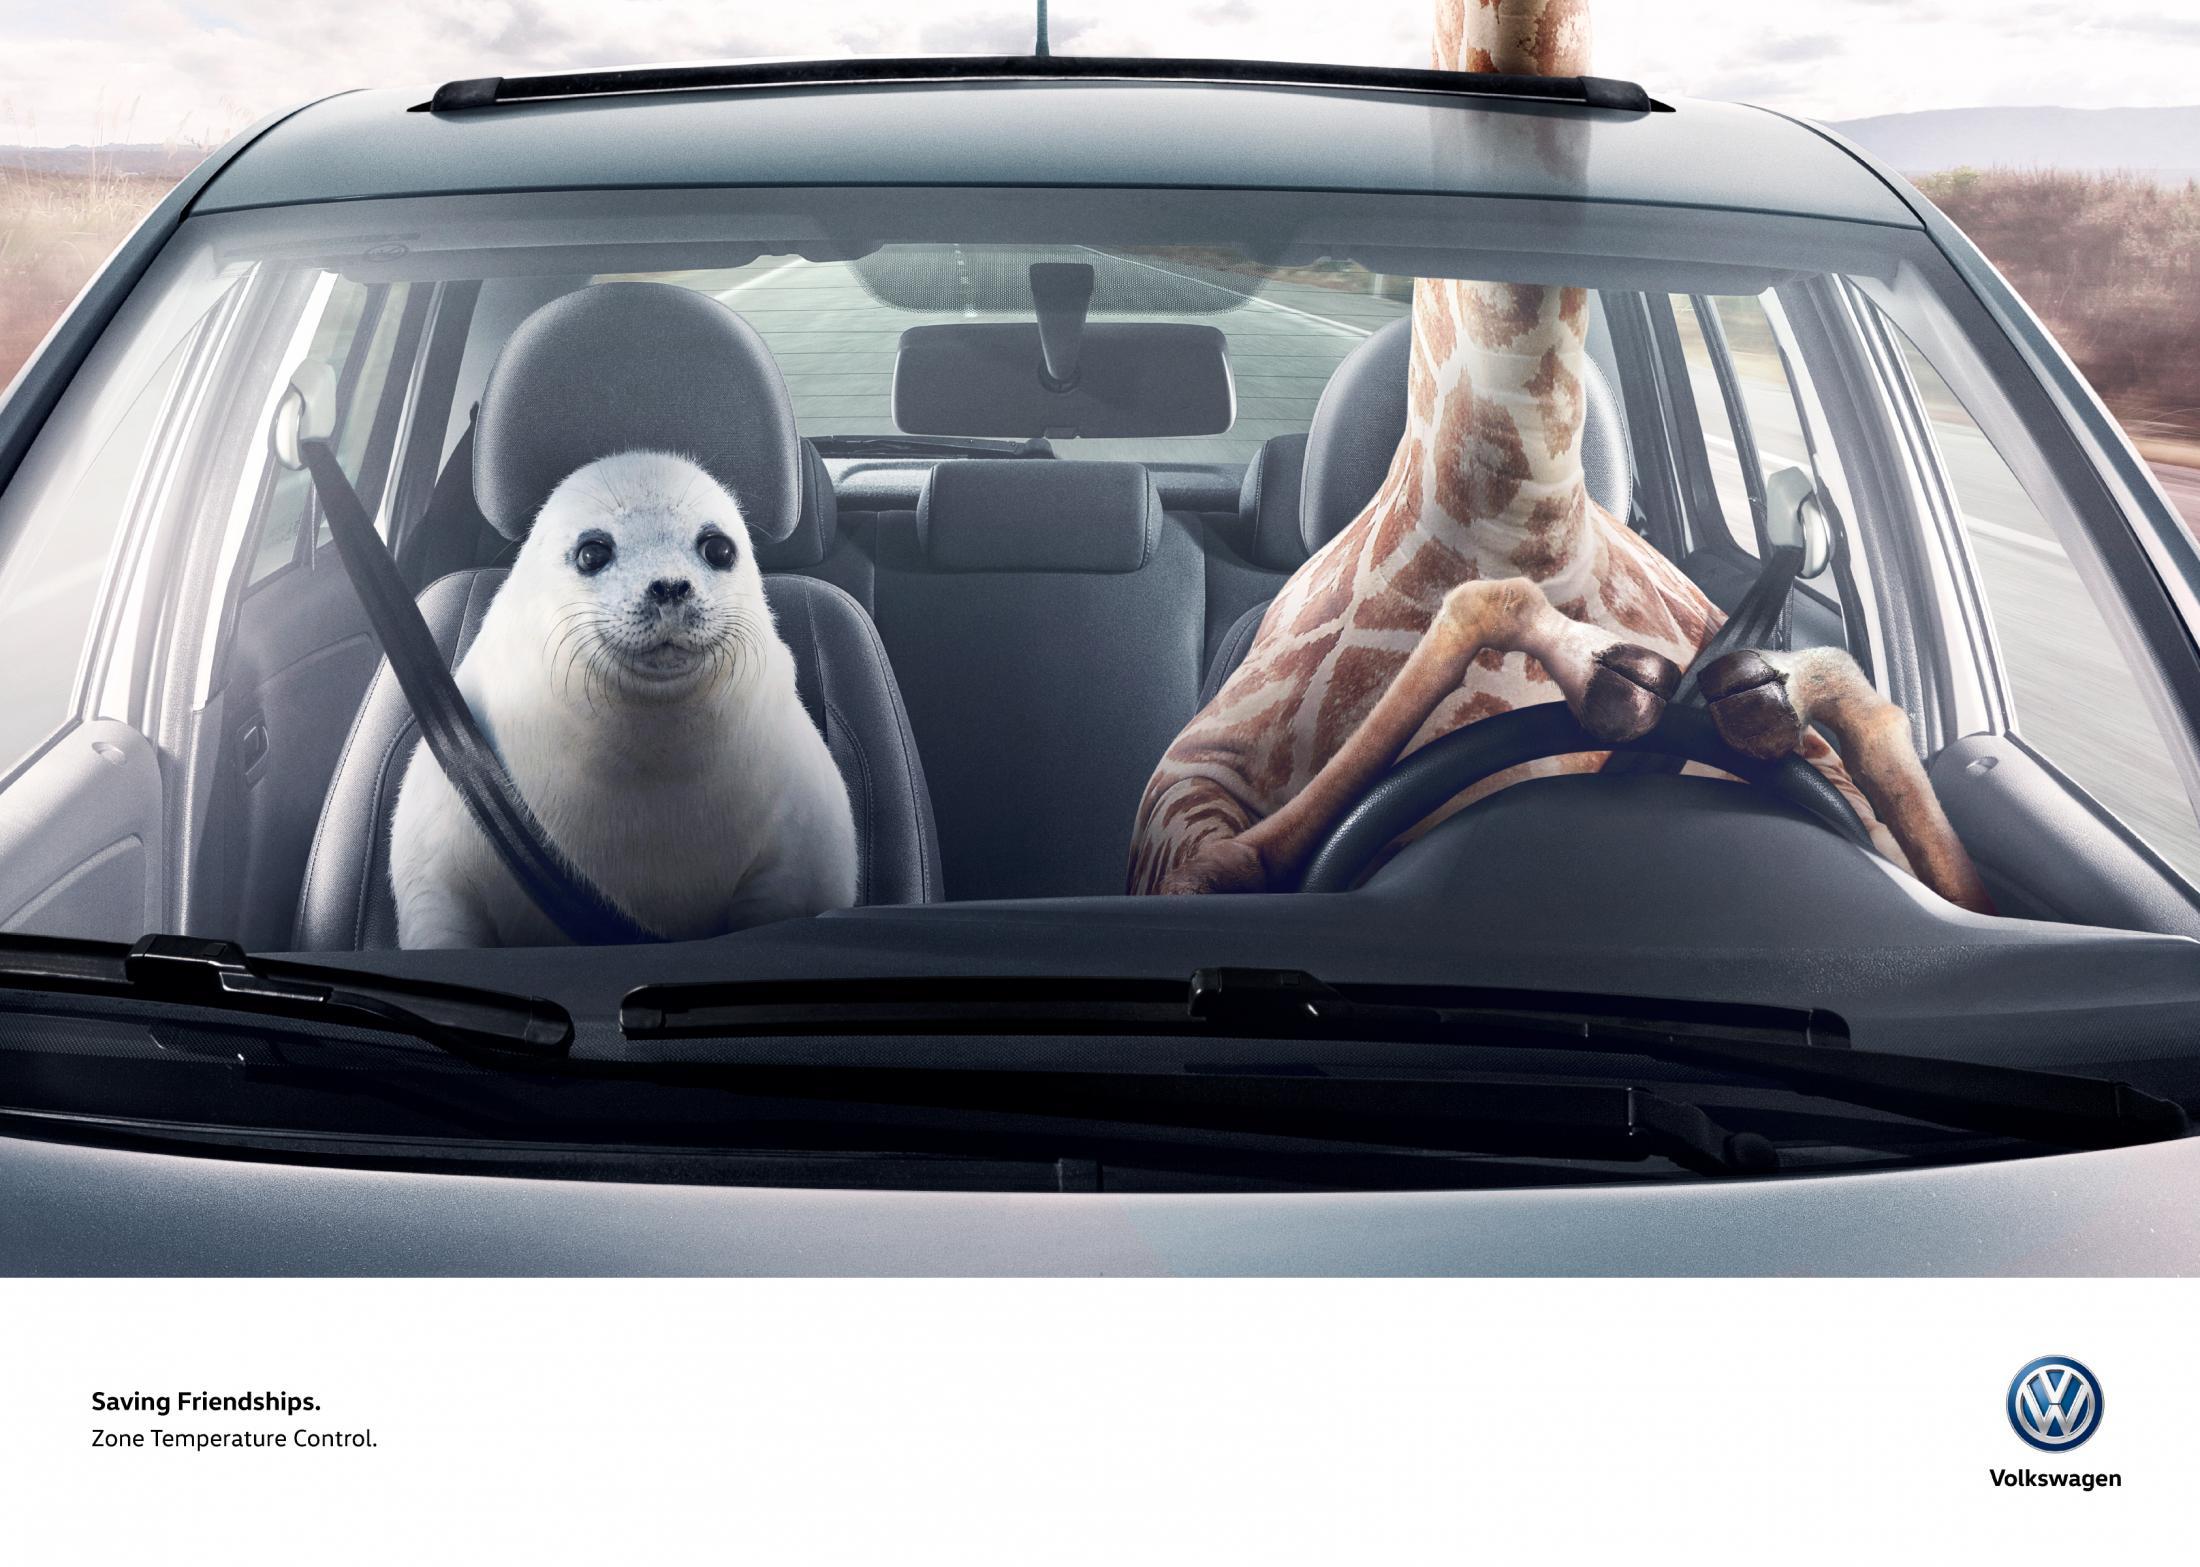 Volkswagen Print Ad - Giraffe & Seal